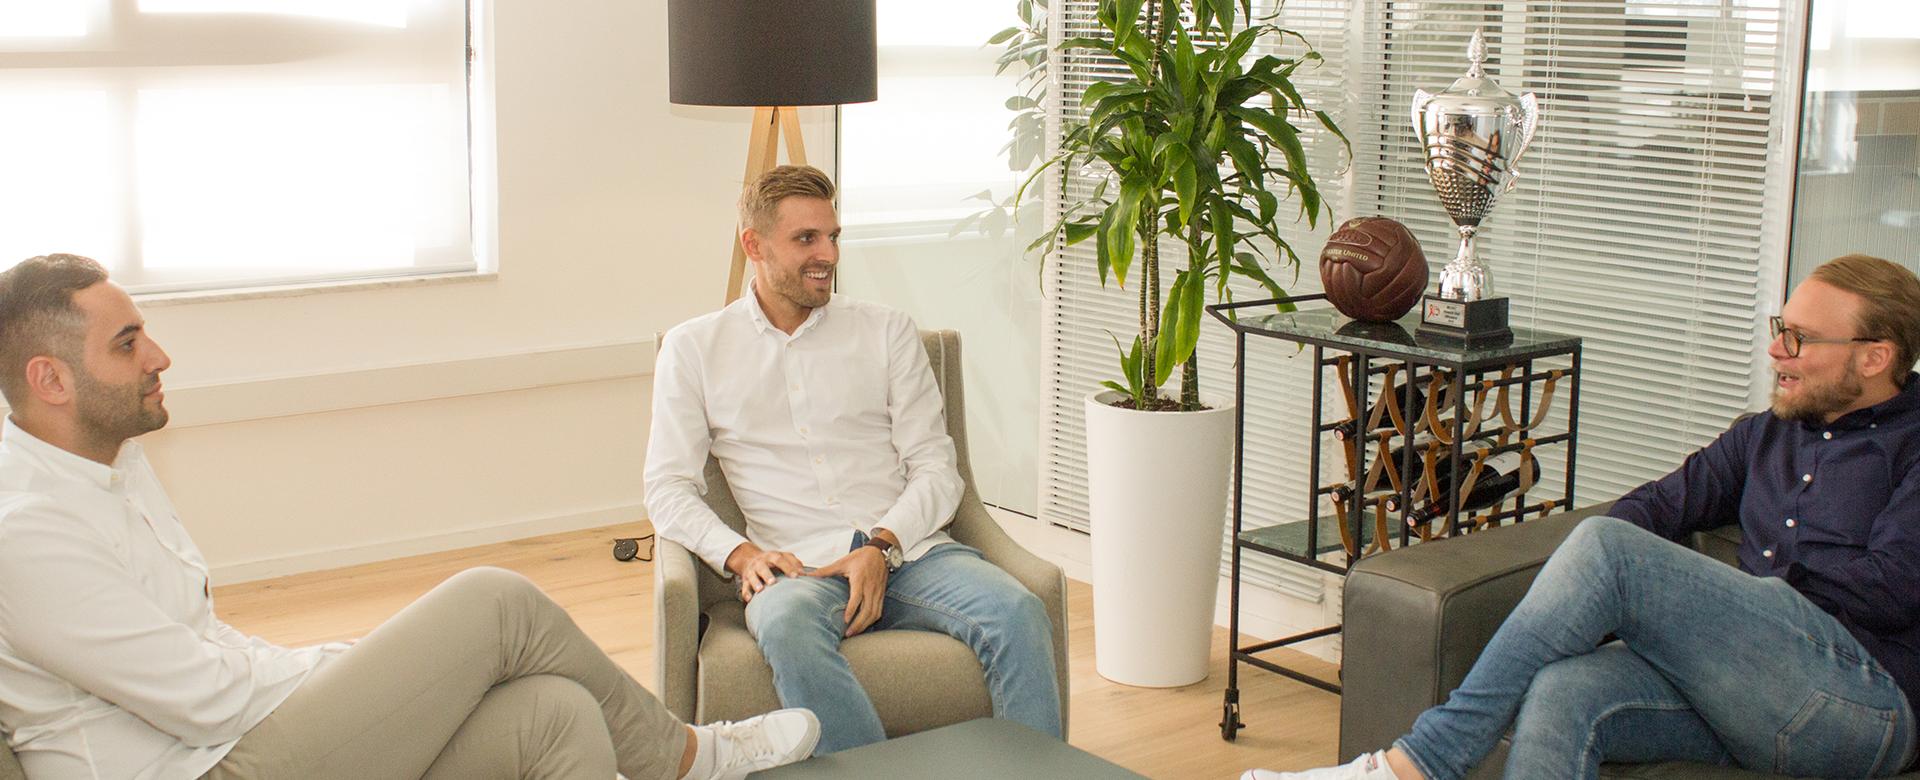 Meet Enteractive's Head of Outbound Sales: Harri Lehtiniemi